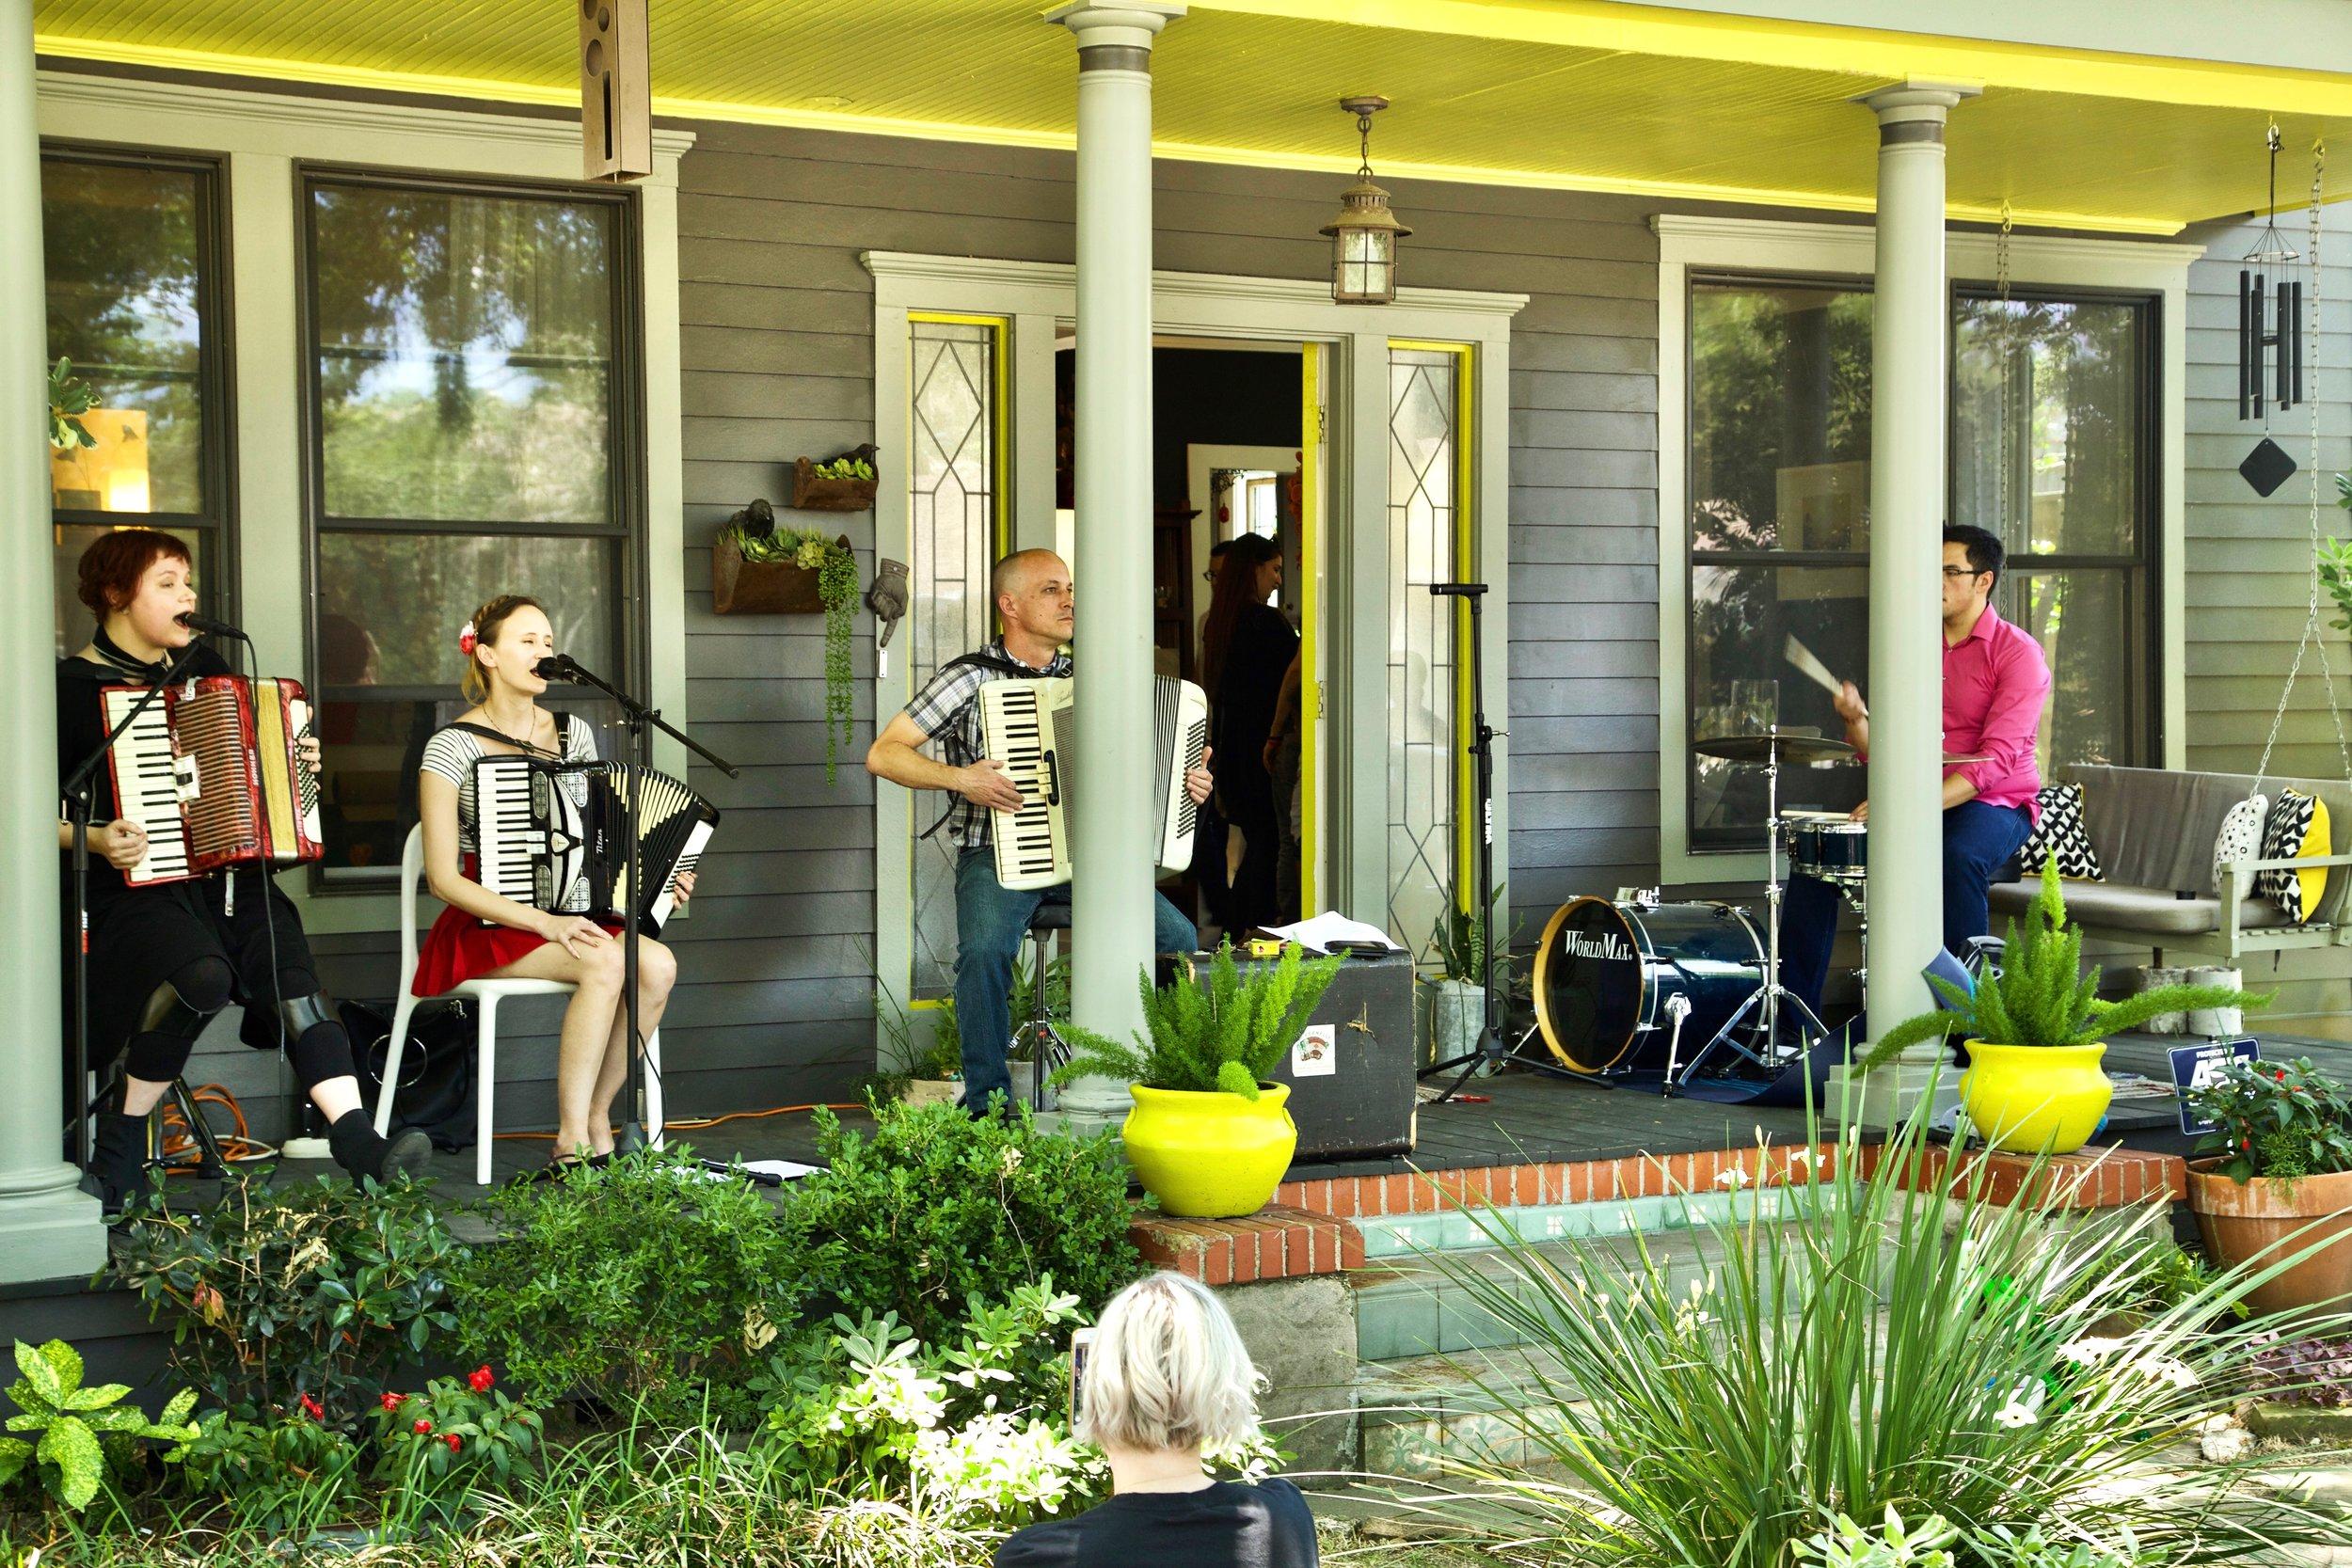 Porch Concert May 2017 19.jpg